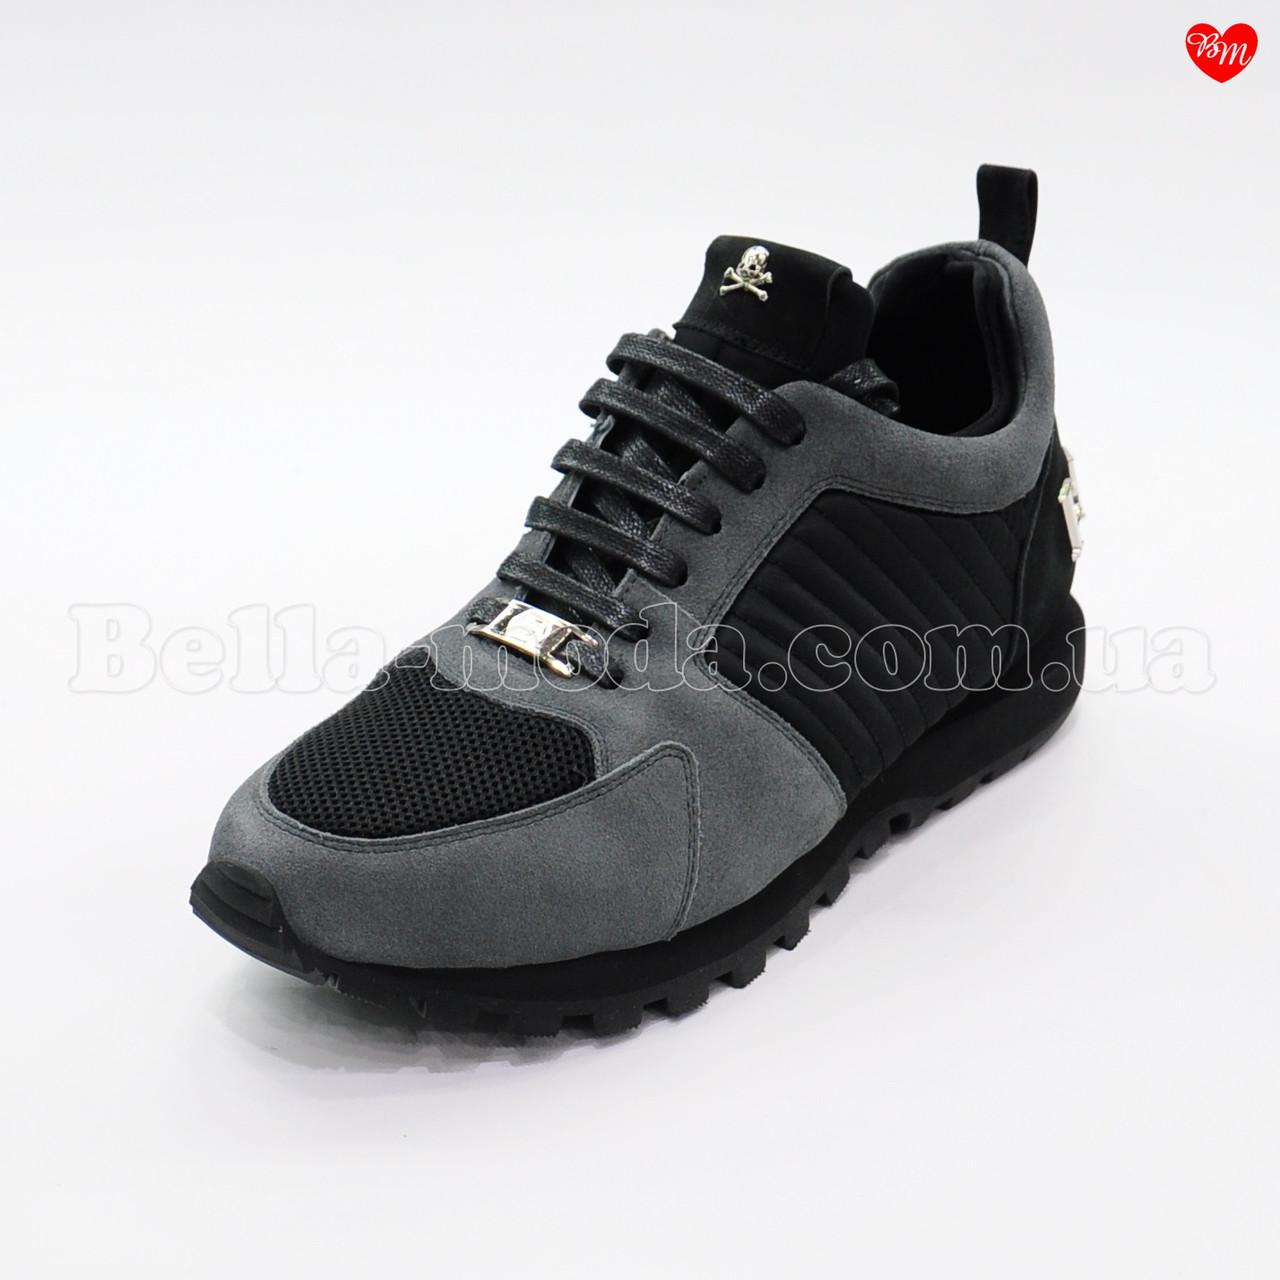 448cd3e7 Купить Мужские кроссовки замша текстиль Philipp Plein в розницу от ...